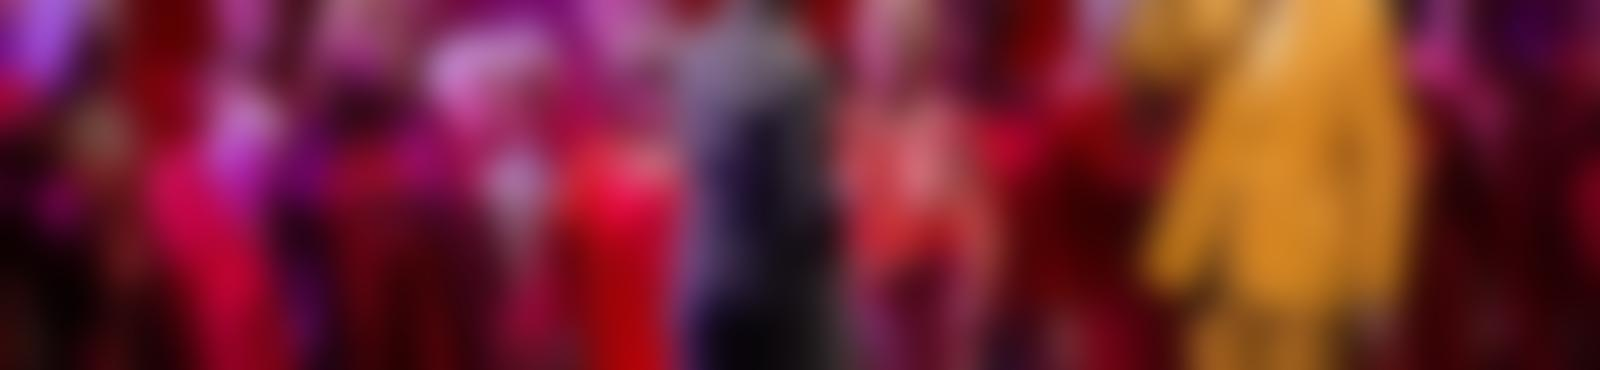 Blurred 6baabaed ed55 47af b95c 65598d248f28